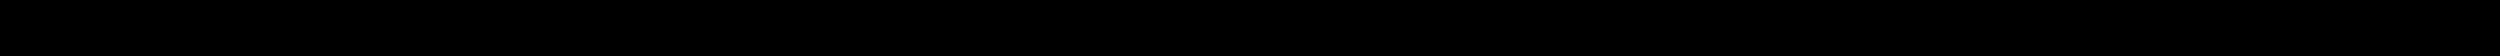 Black Panel.jpg